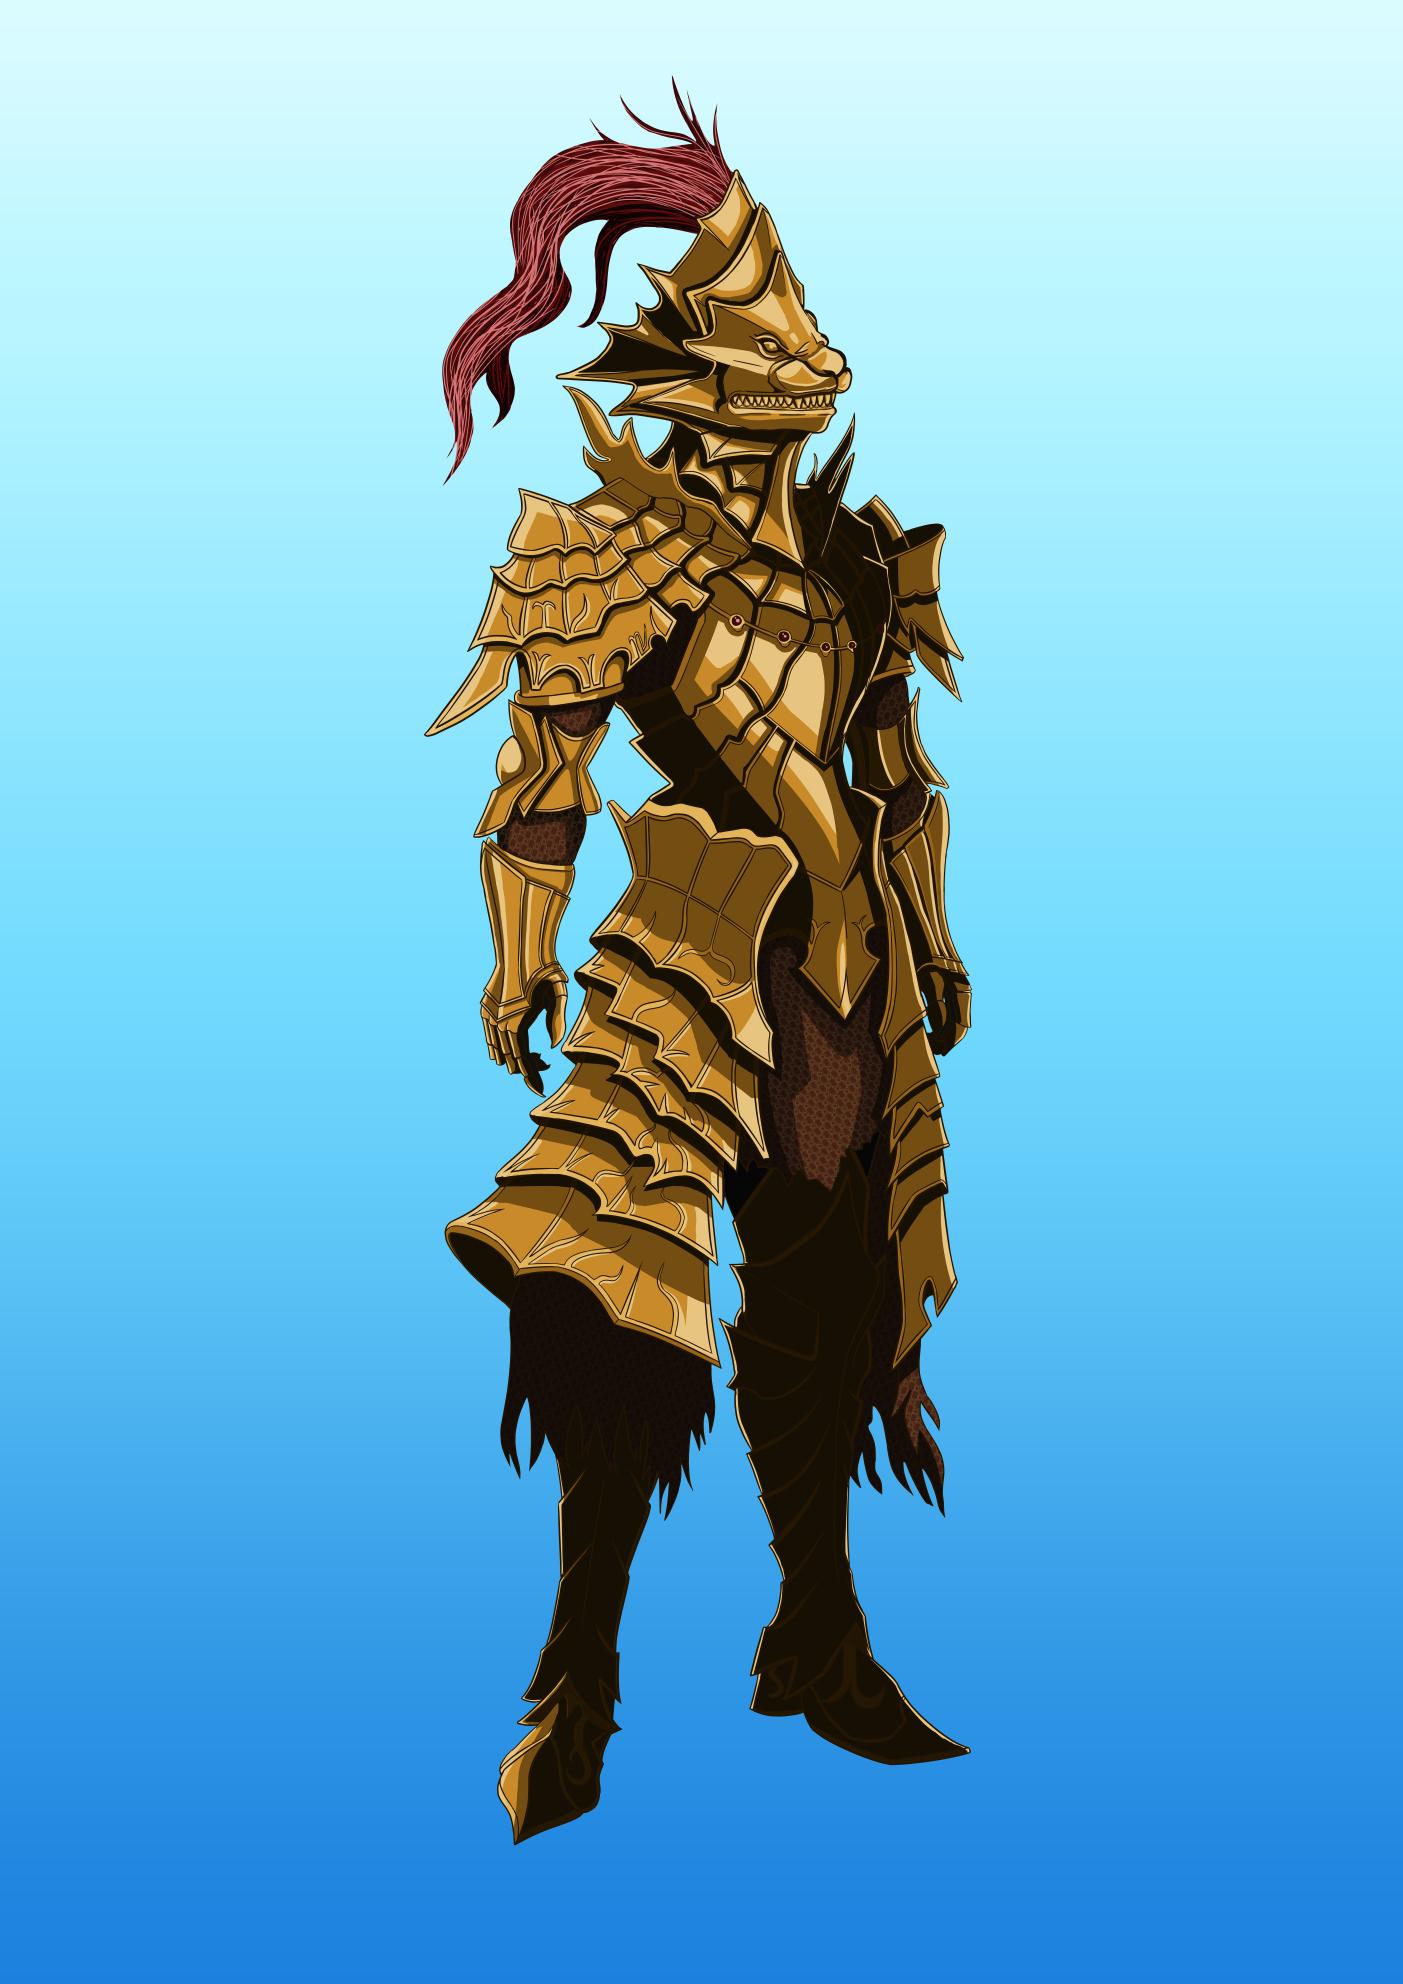 Ornstein, The Dragon Slayer